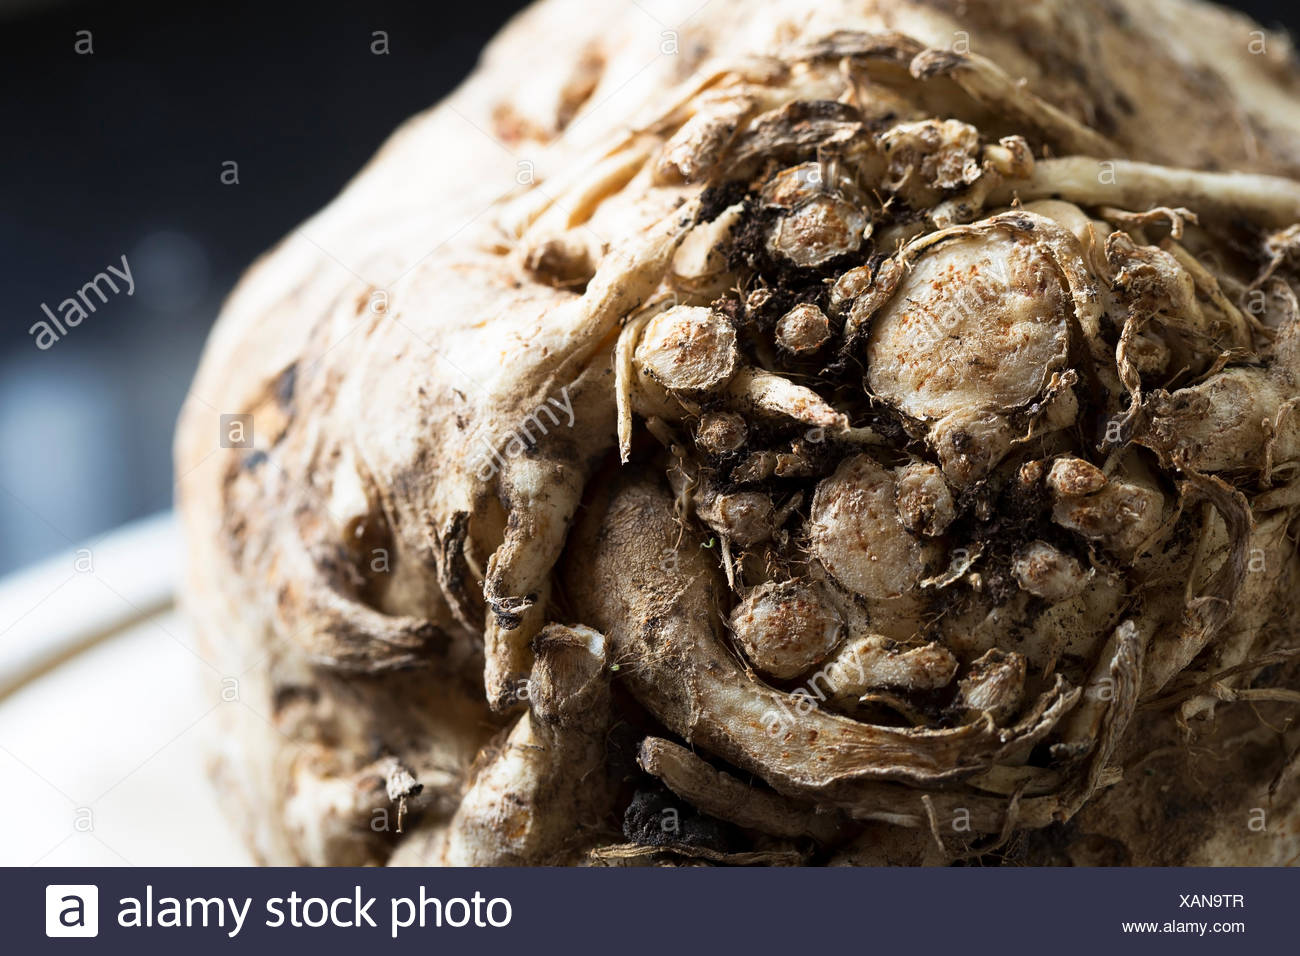 Knollensellerie, Wurzelgemüse vor kurzem geerntet. Stockbild